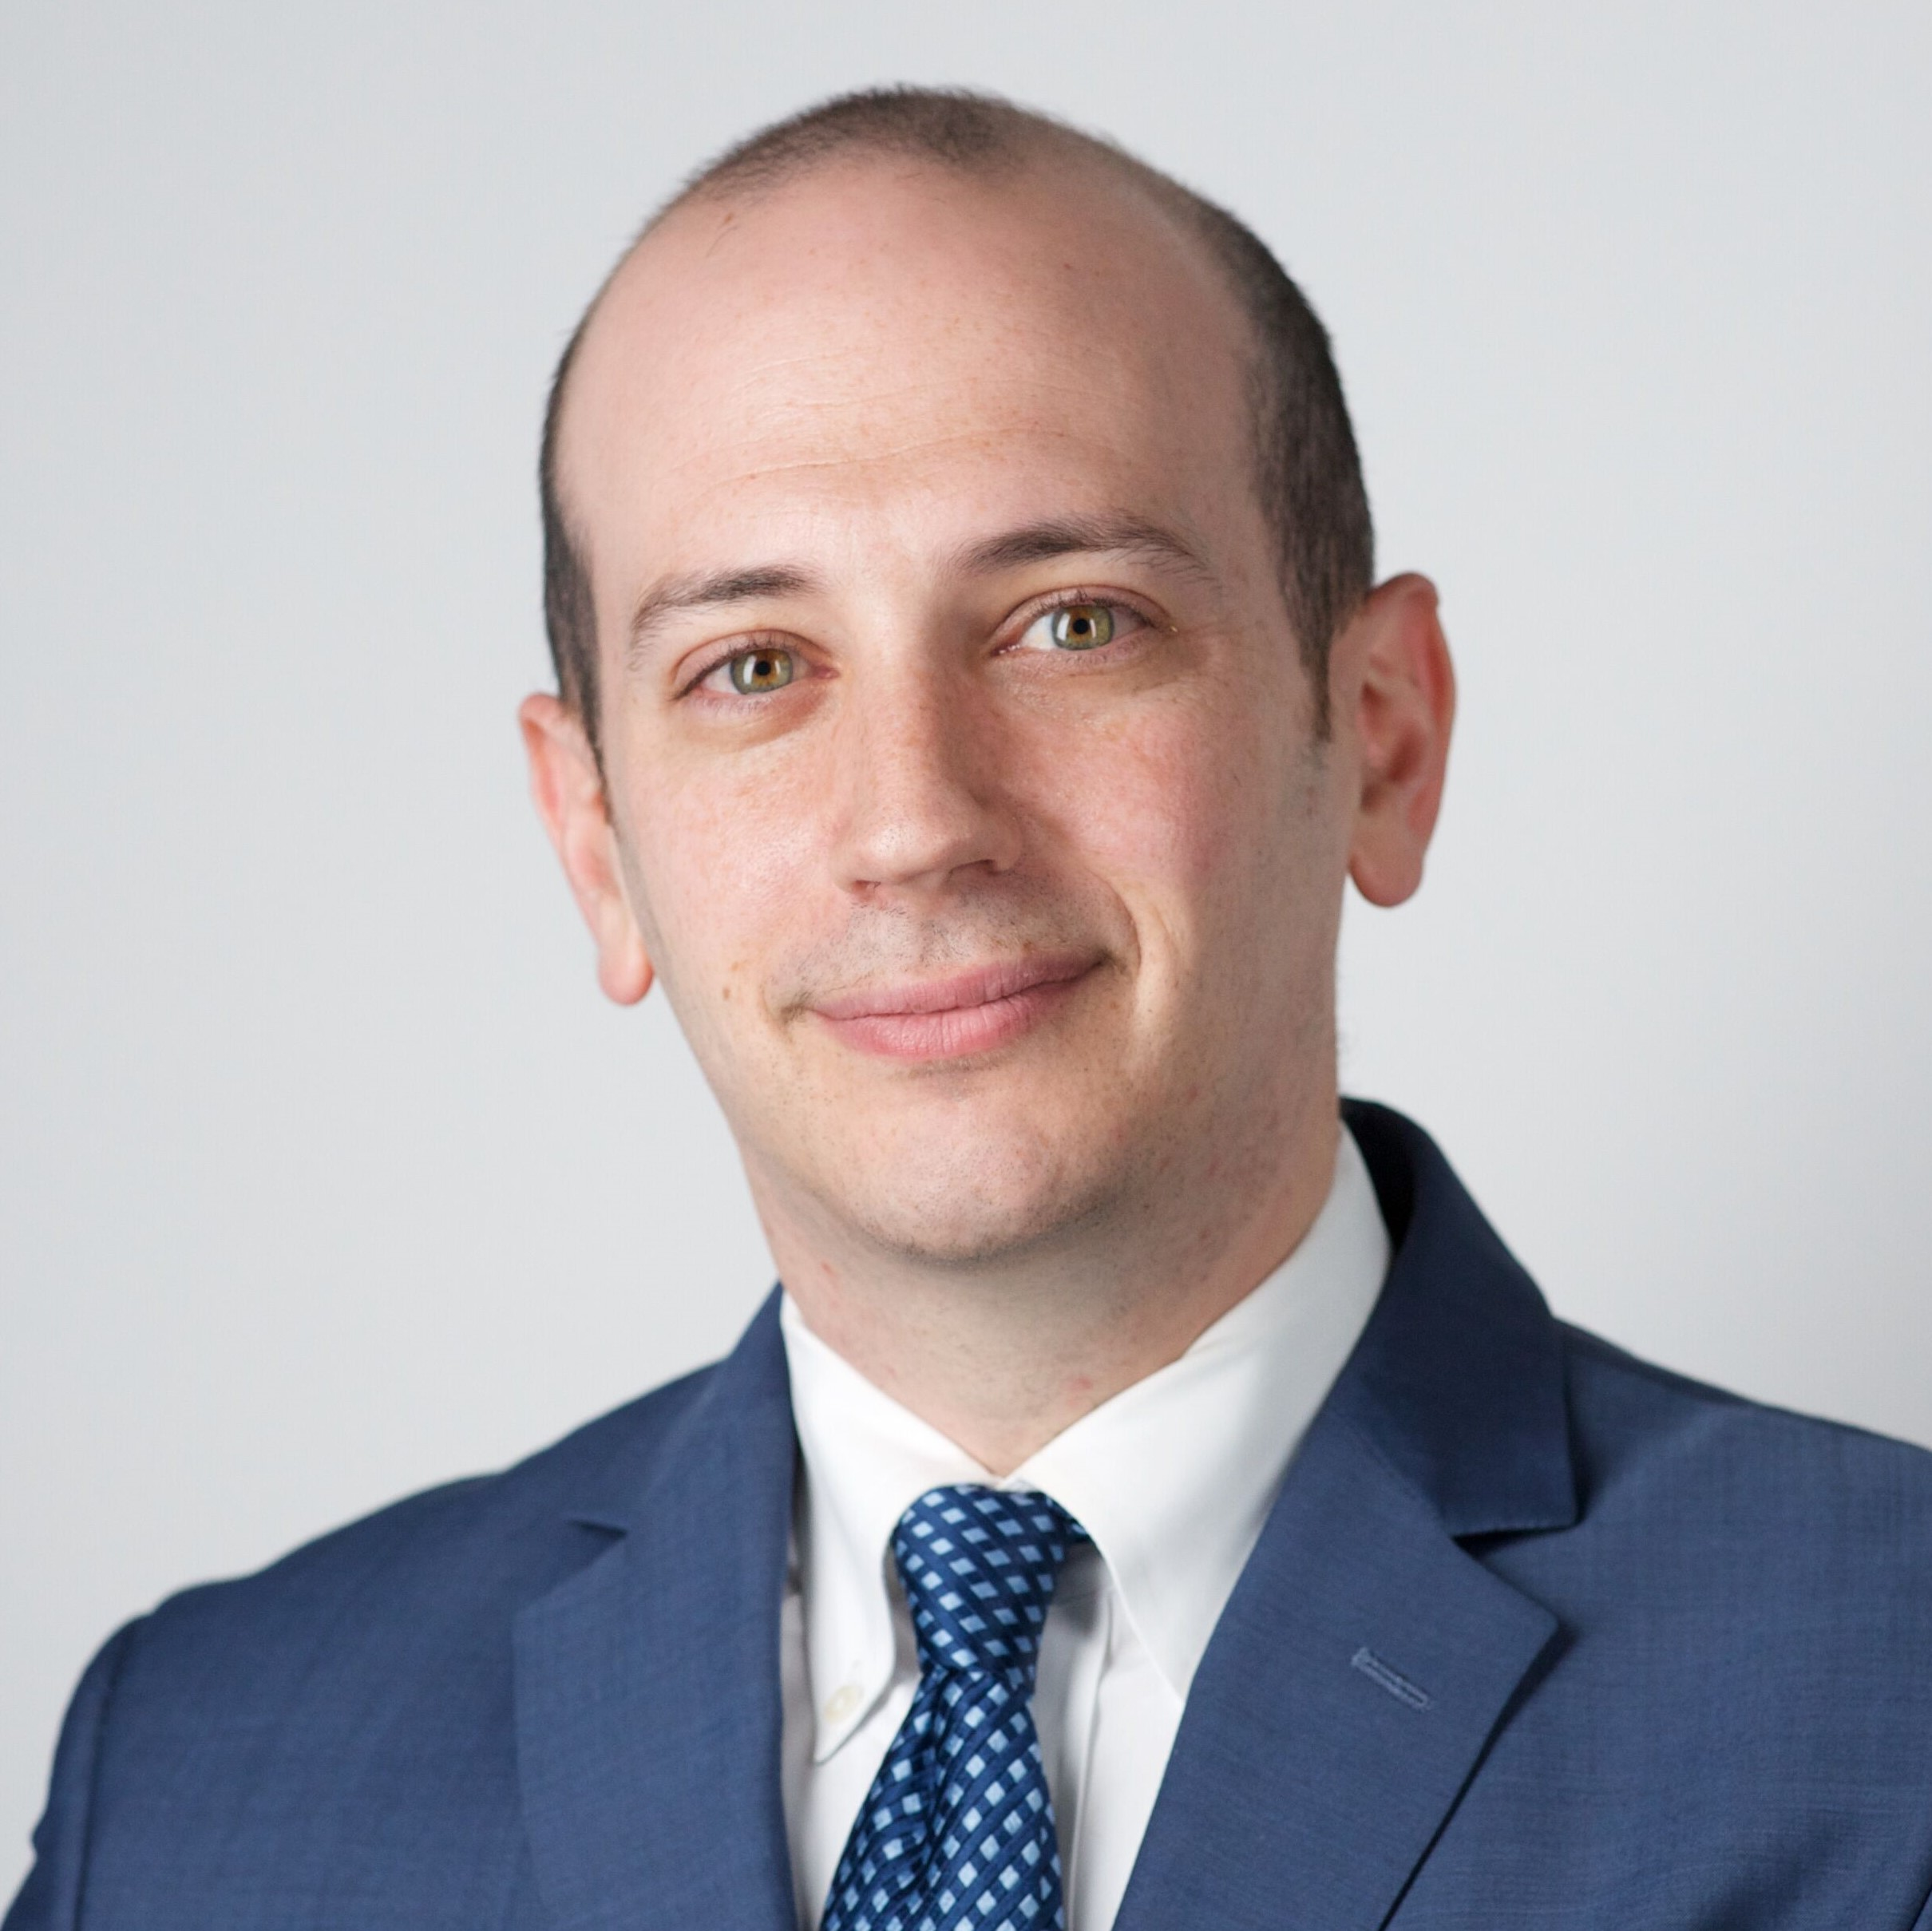 Daniel Greenbaum